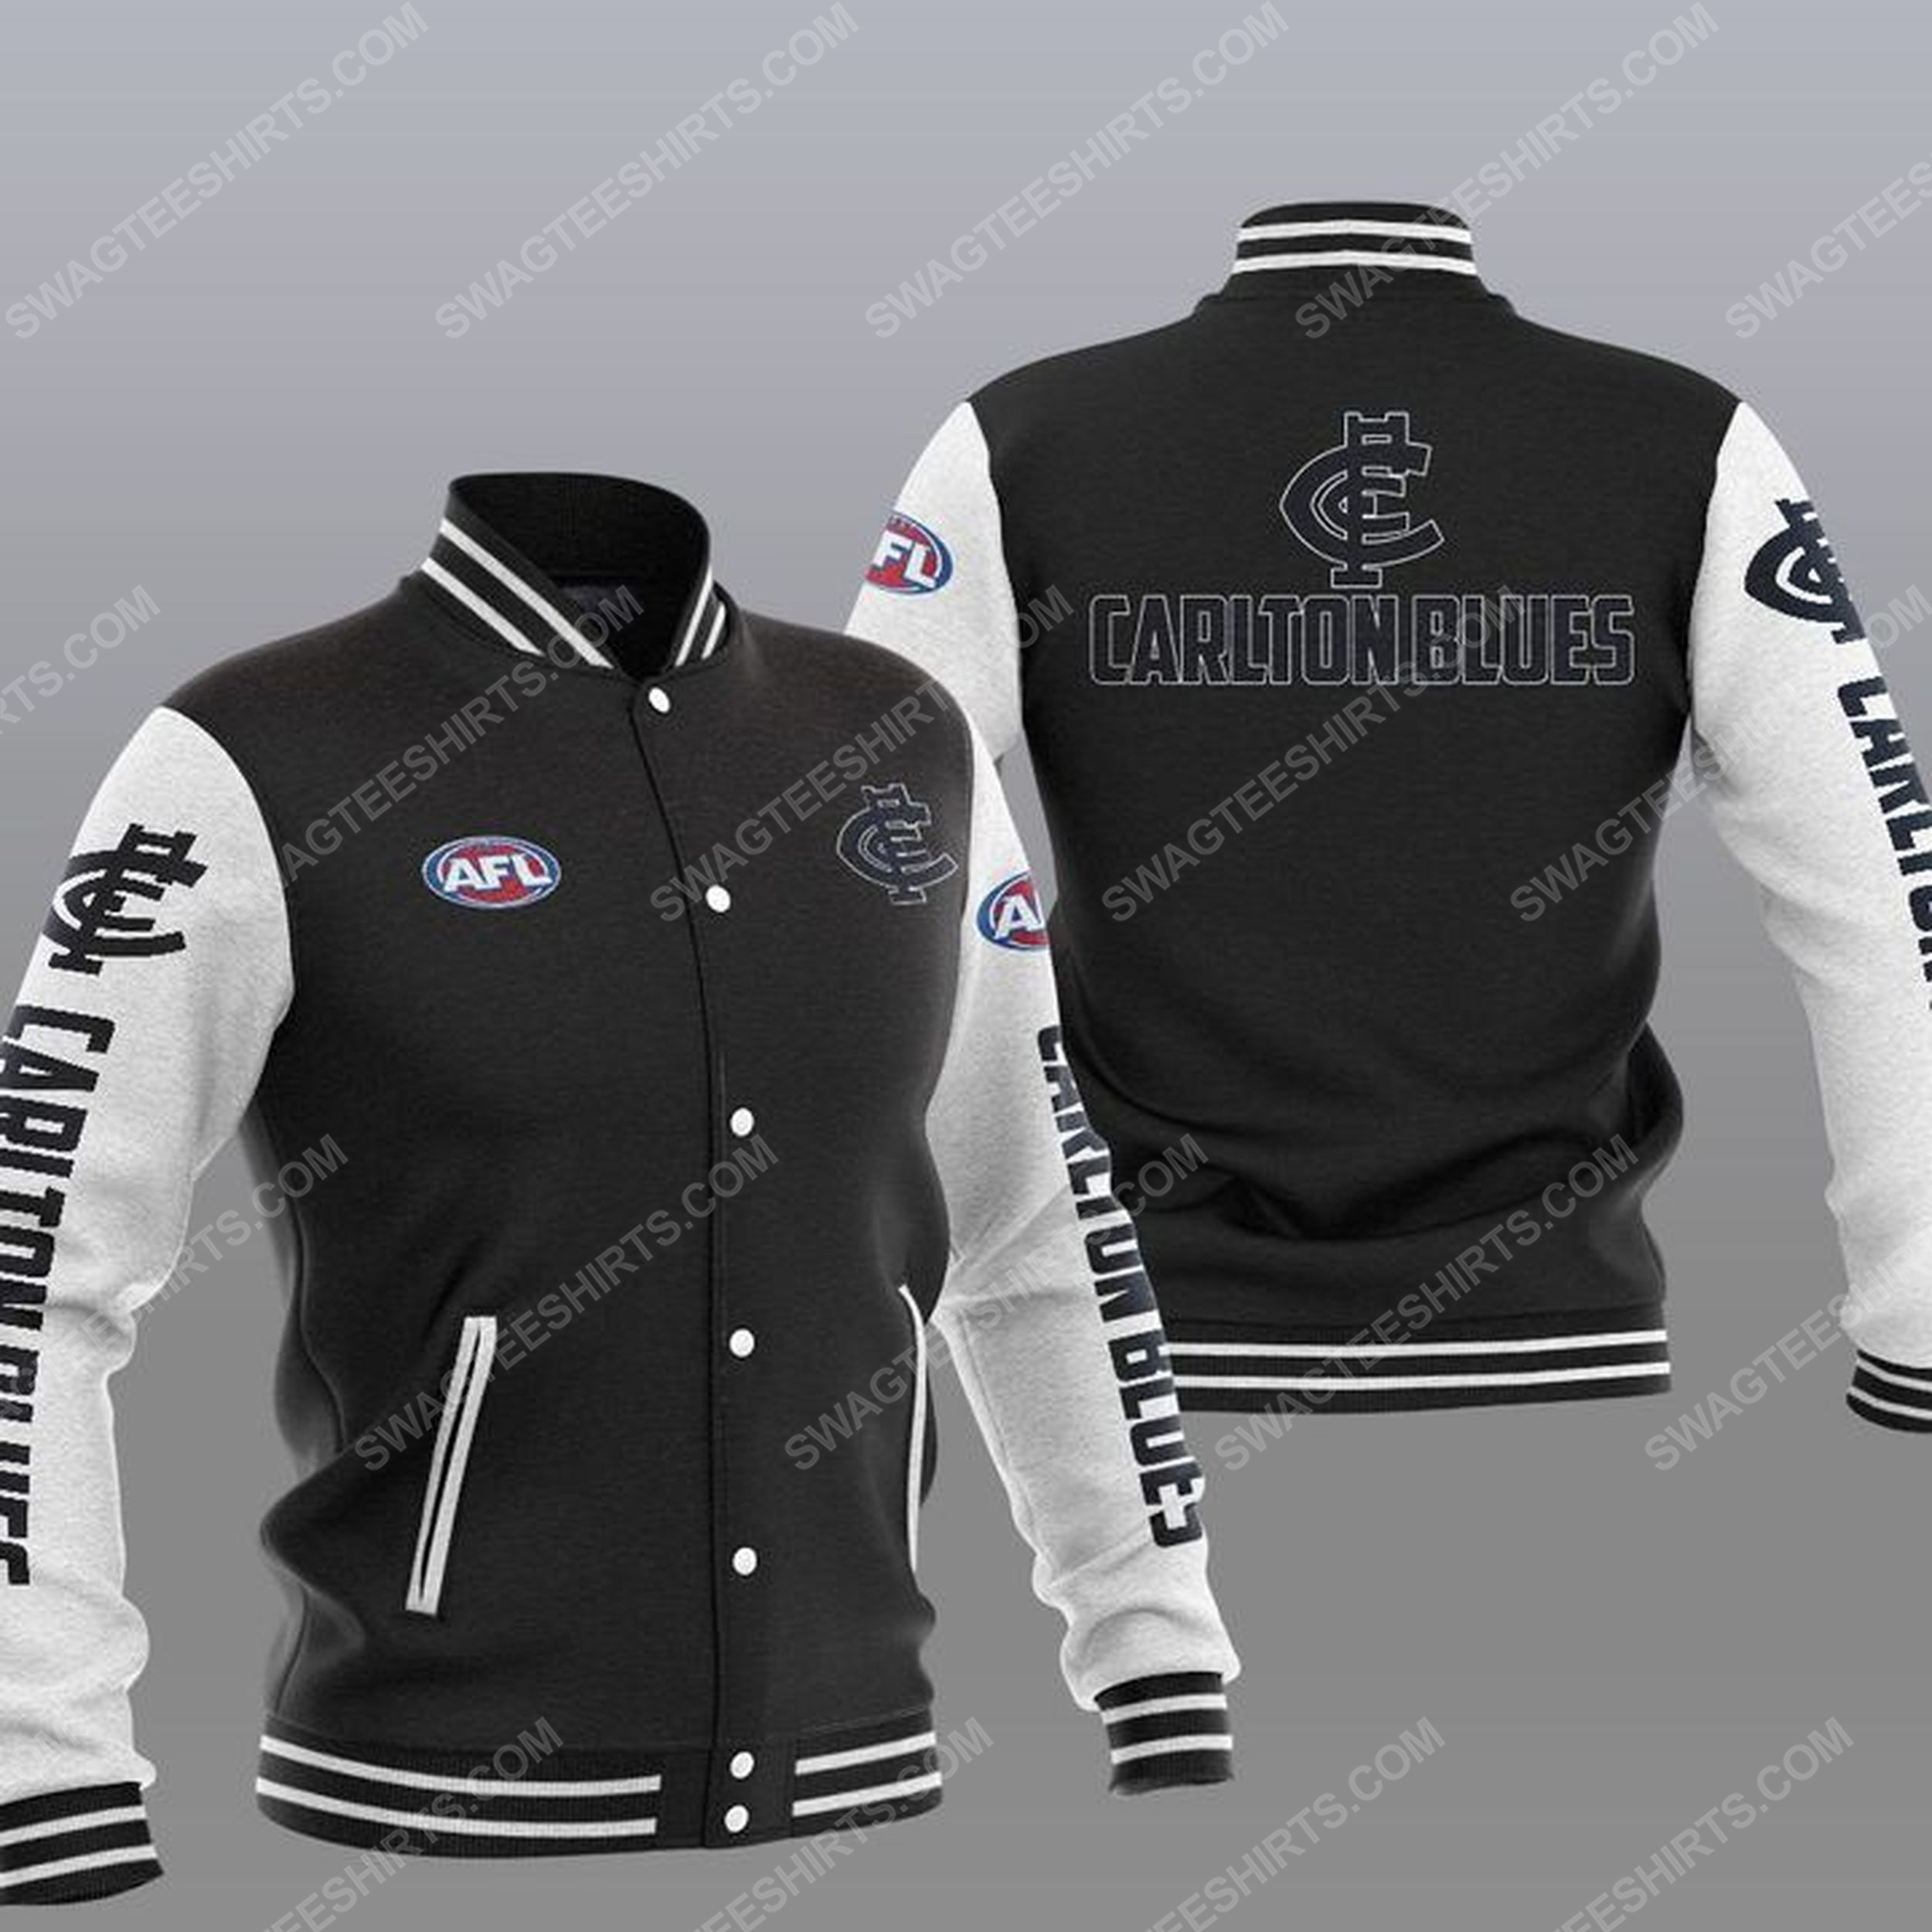 The carlton football club all over print baseball jacket - black 1